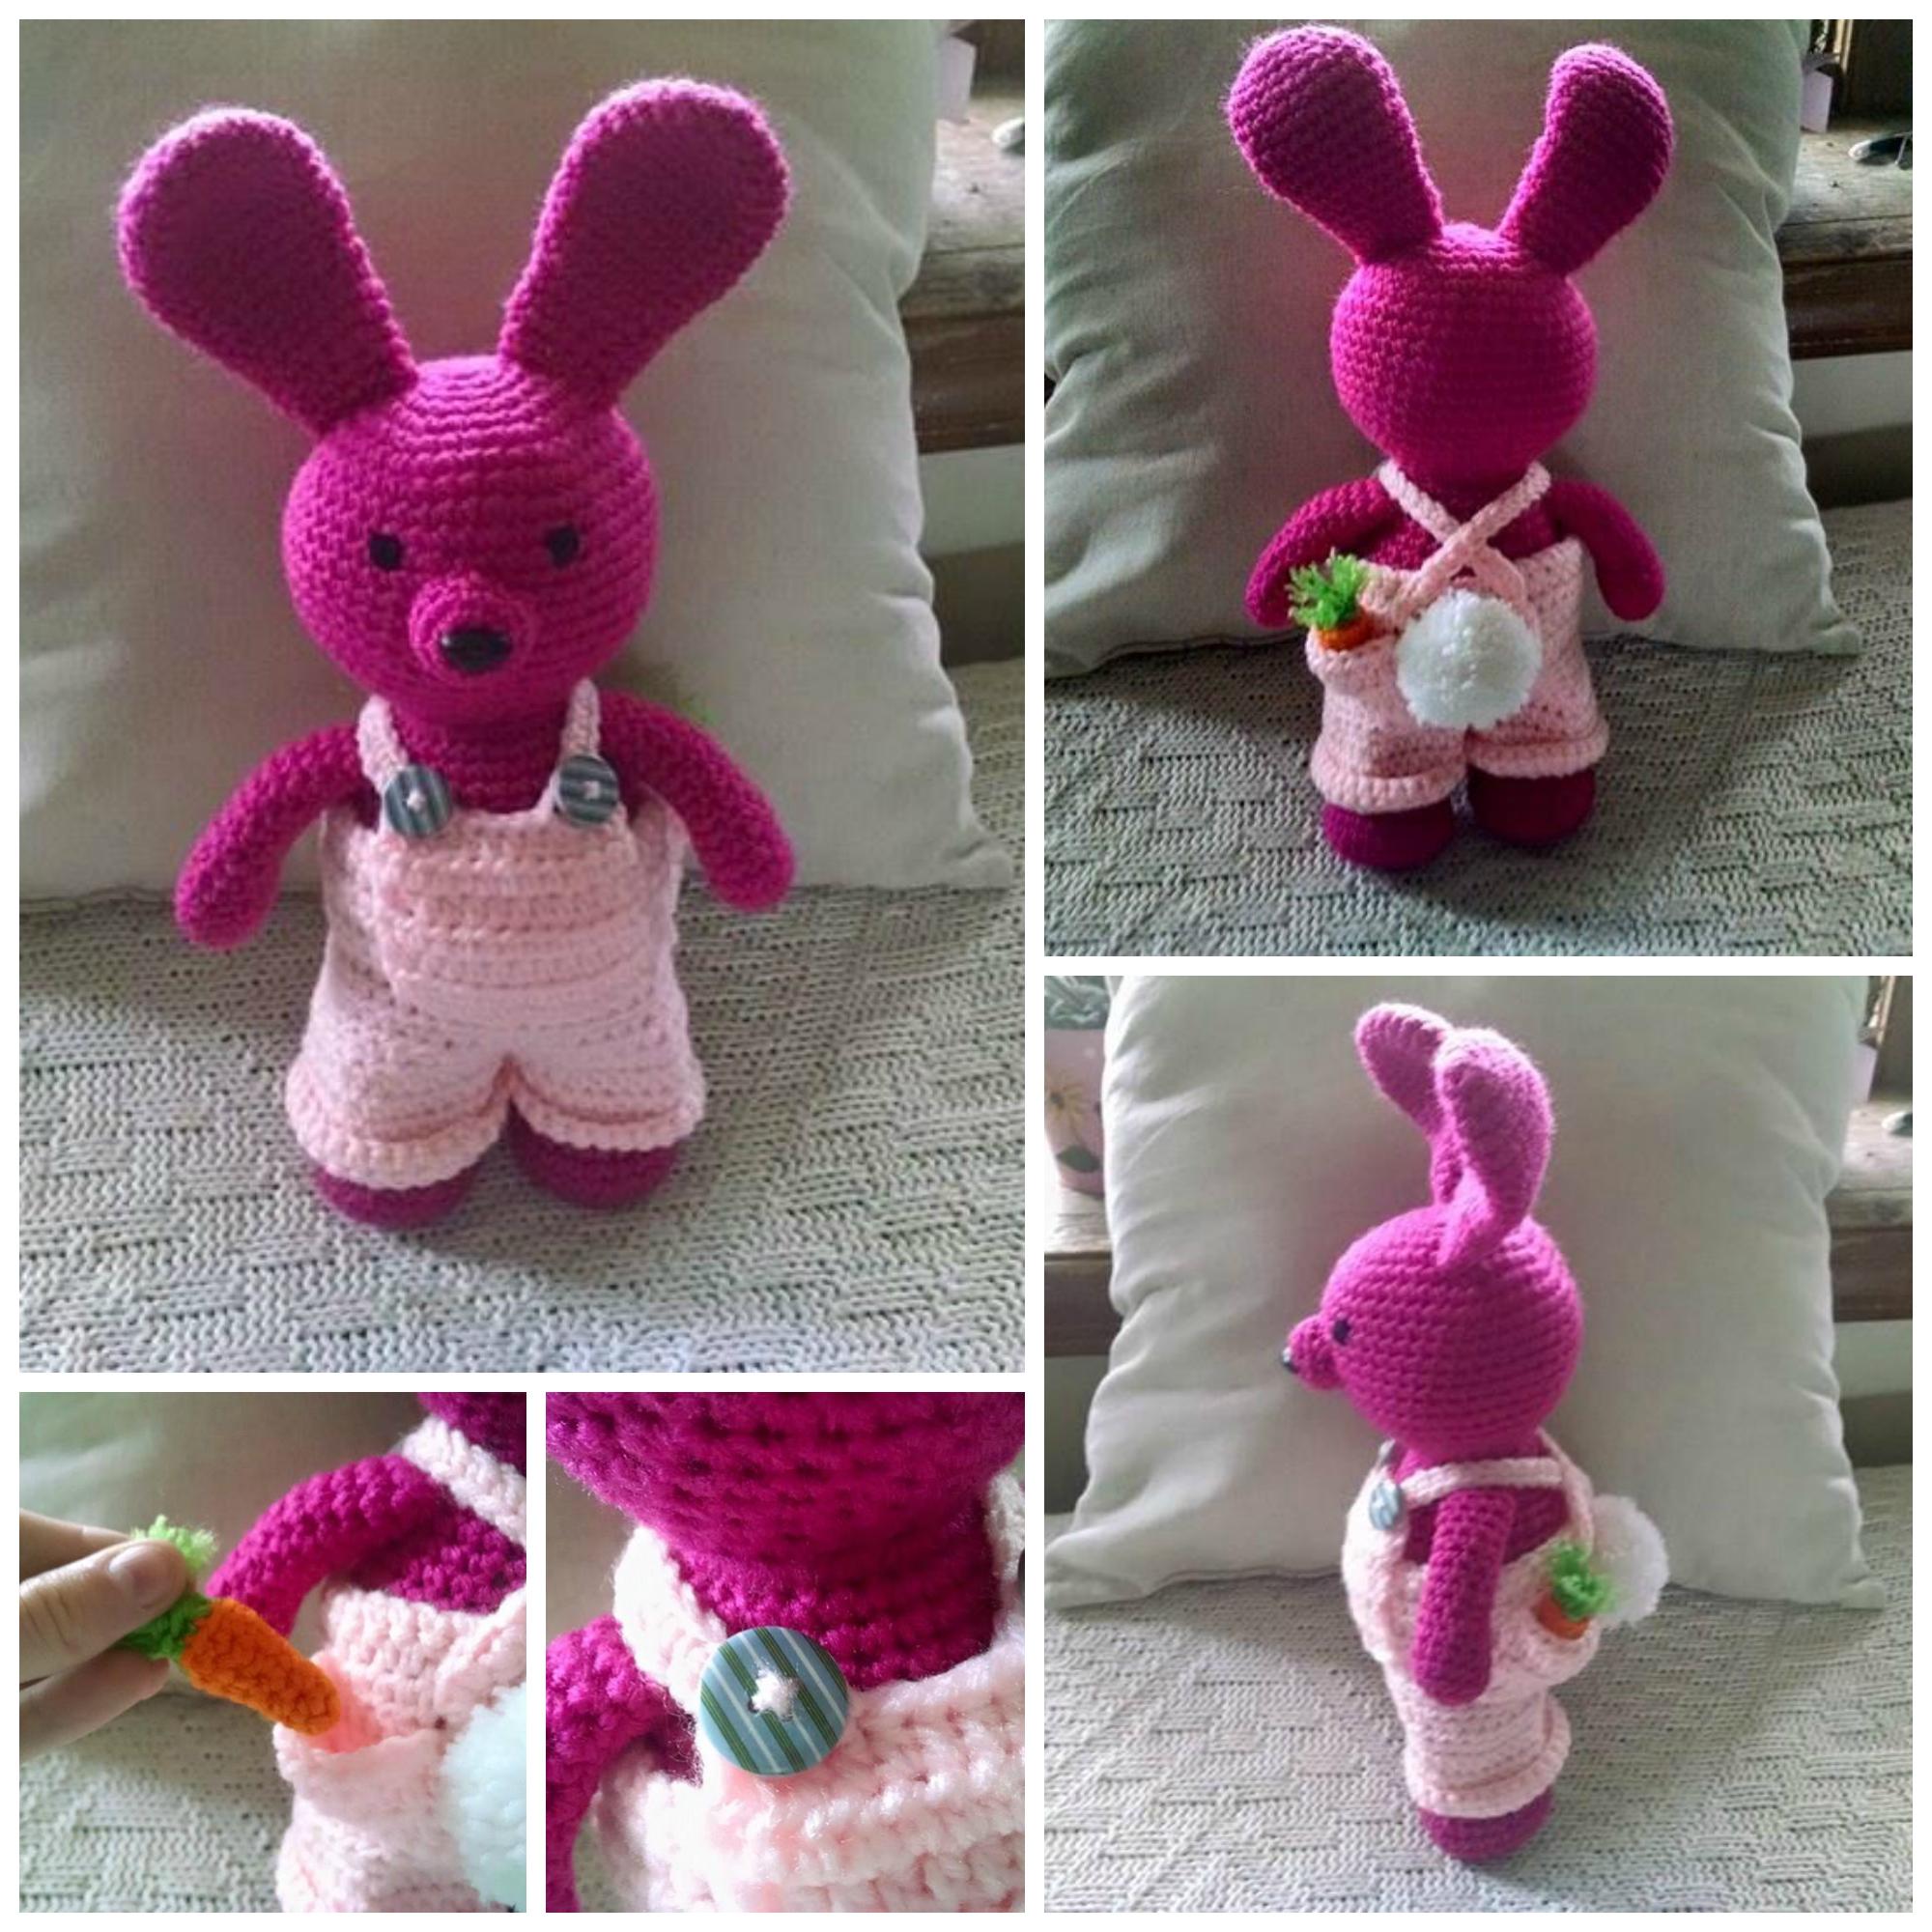 Crochet Amigurumi Easter Bunny : Amigurumi Crochet Easter Bunny by Mickeycricky on DeviantArt